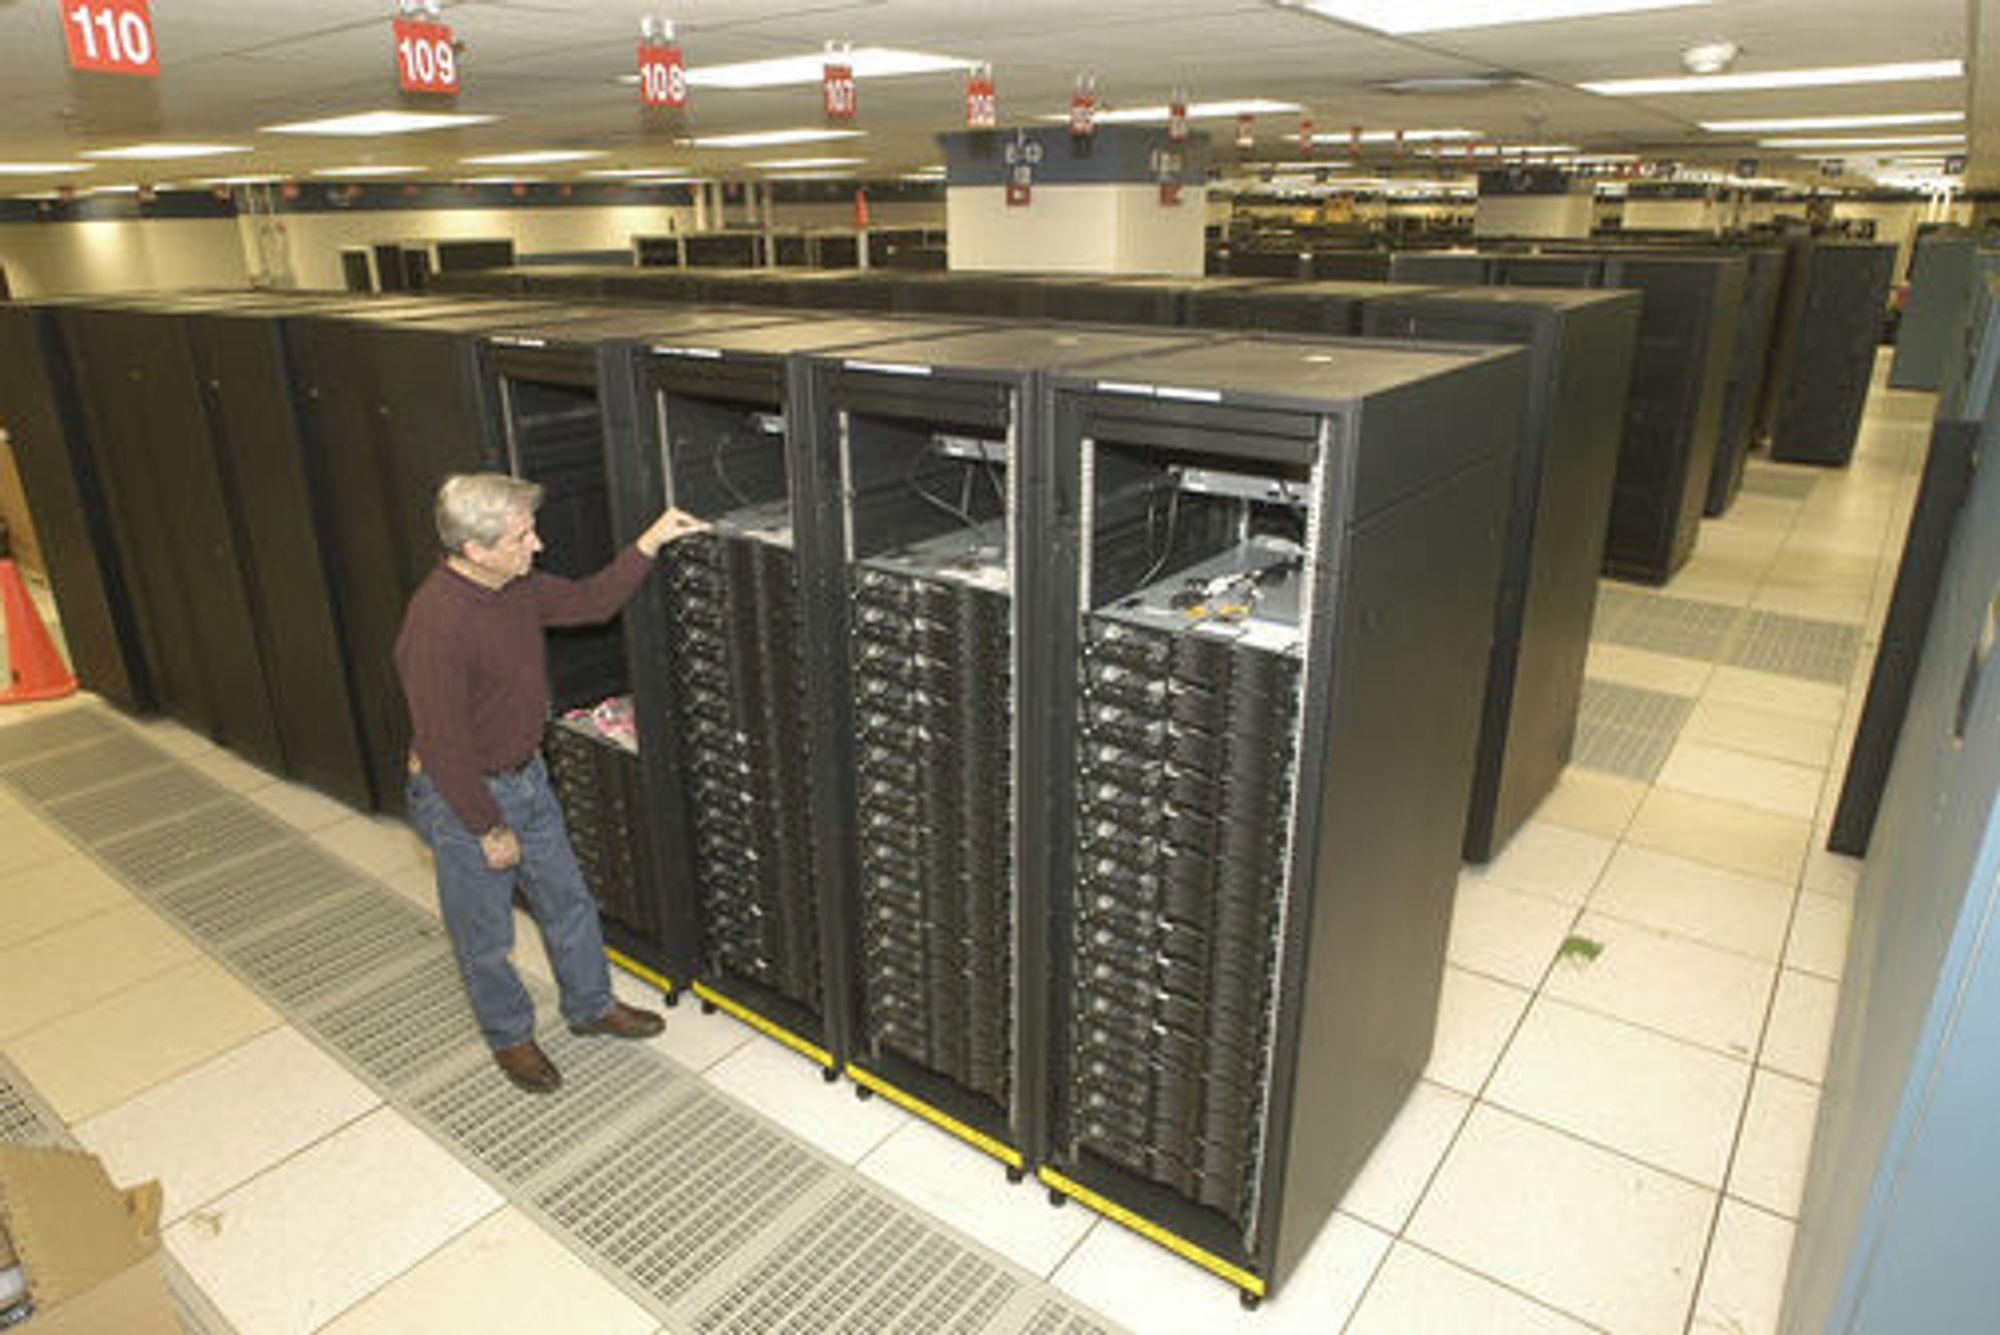 IBM Roadrunner ved Los Alamos National Laboratory beholder førsteplassen.